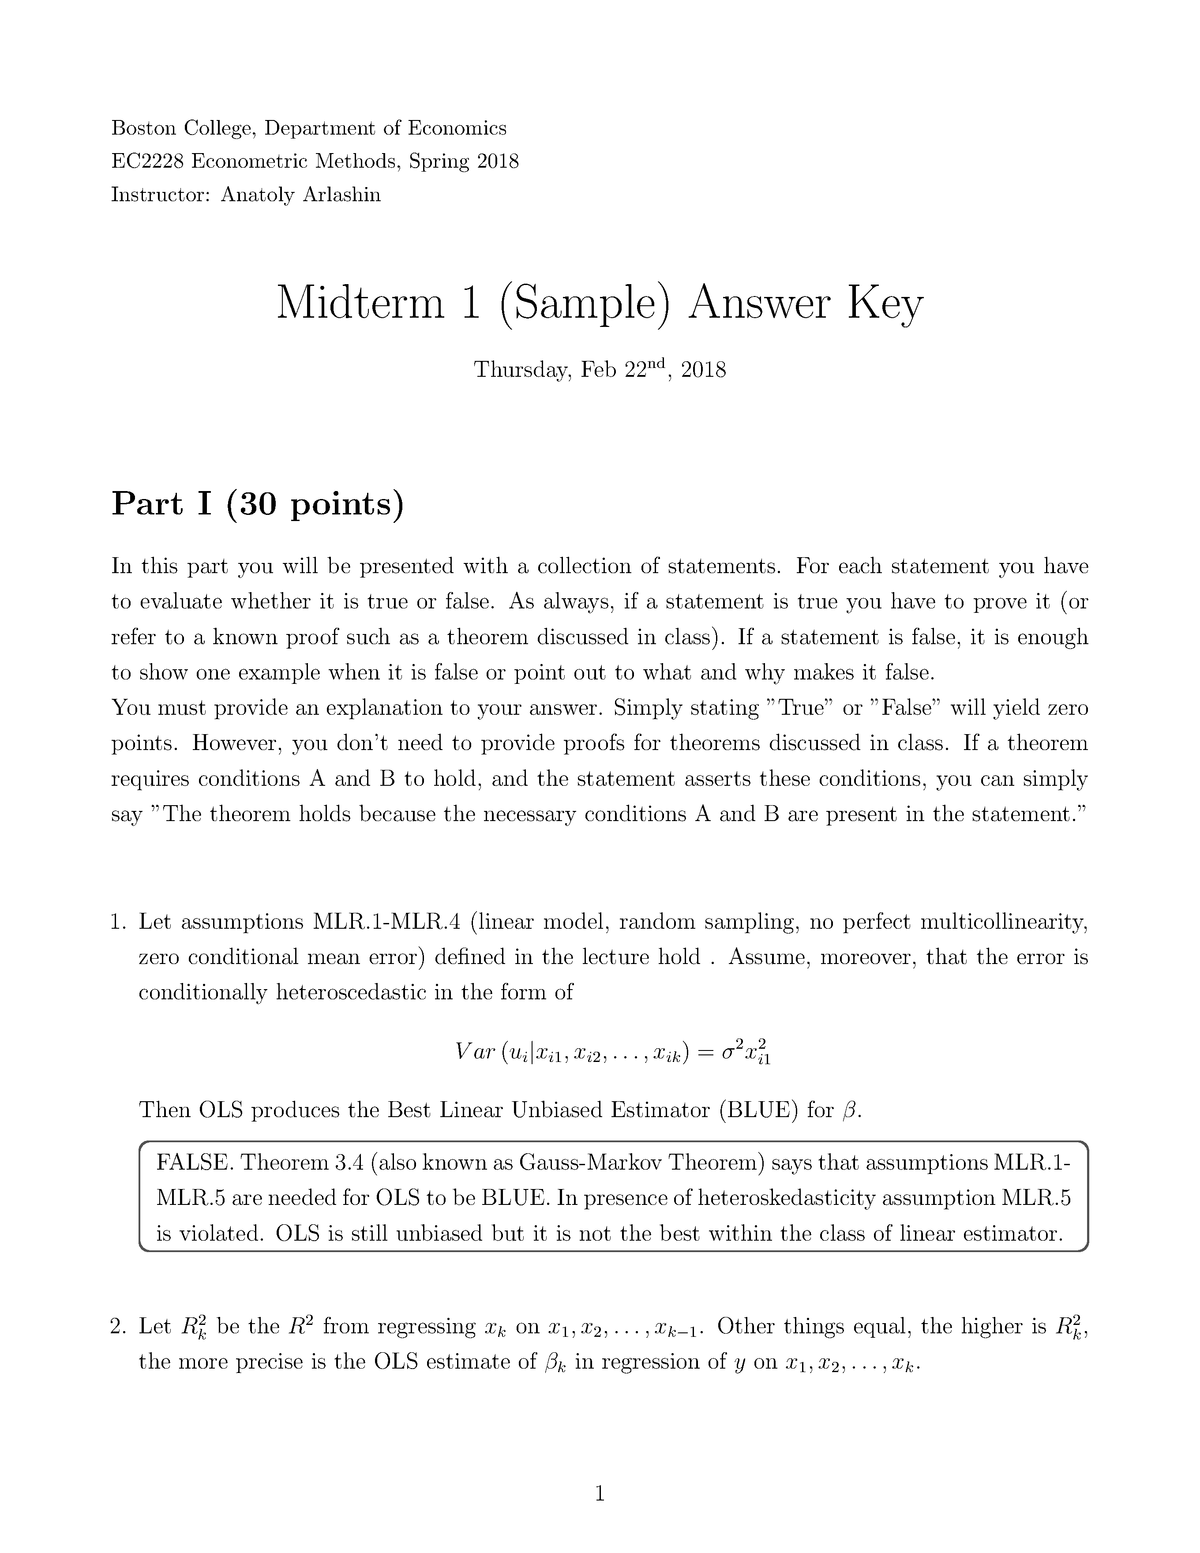 Midterm 1 Spring 2018, answers - ADEC732001 Econometrics